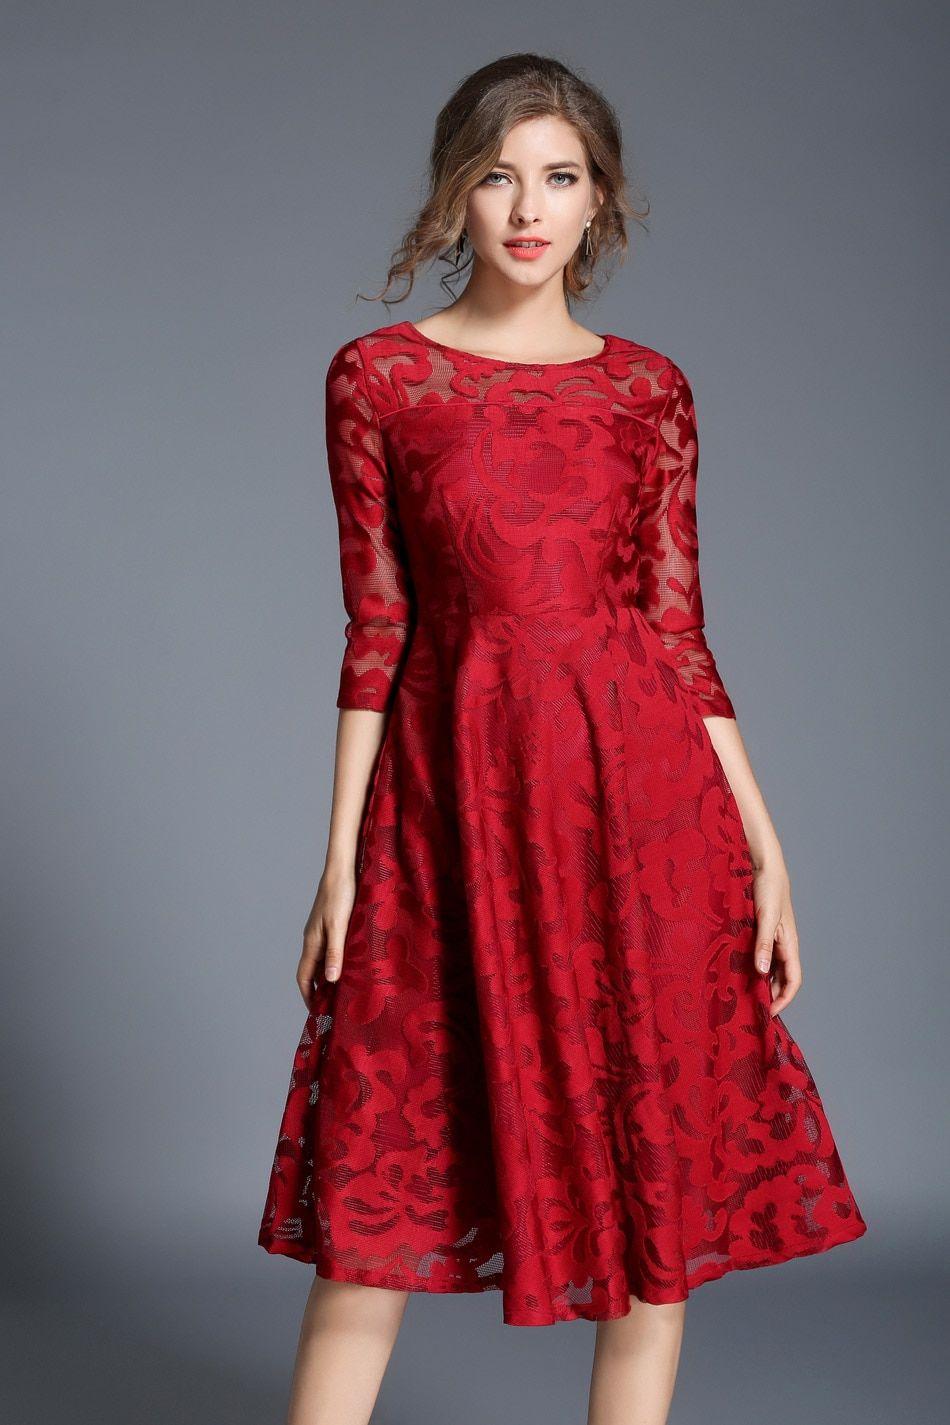 Bayan Dantel Elbise Bayan Elbise Online Elbise Ucuz Elbise Elbise Satin Al Abiye Elbise Elbise Uzun Elbise Elbiseler